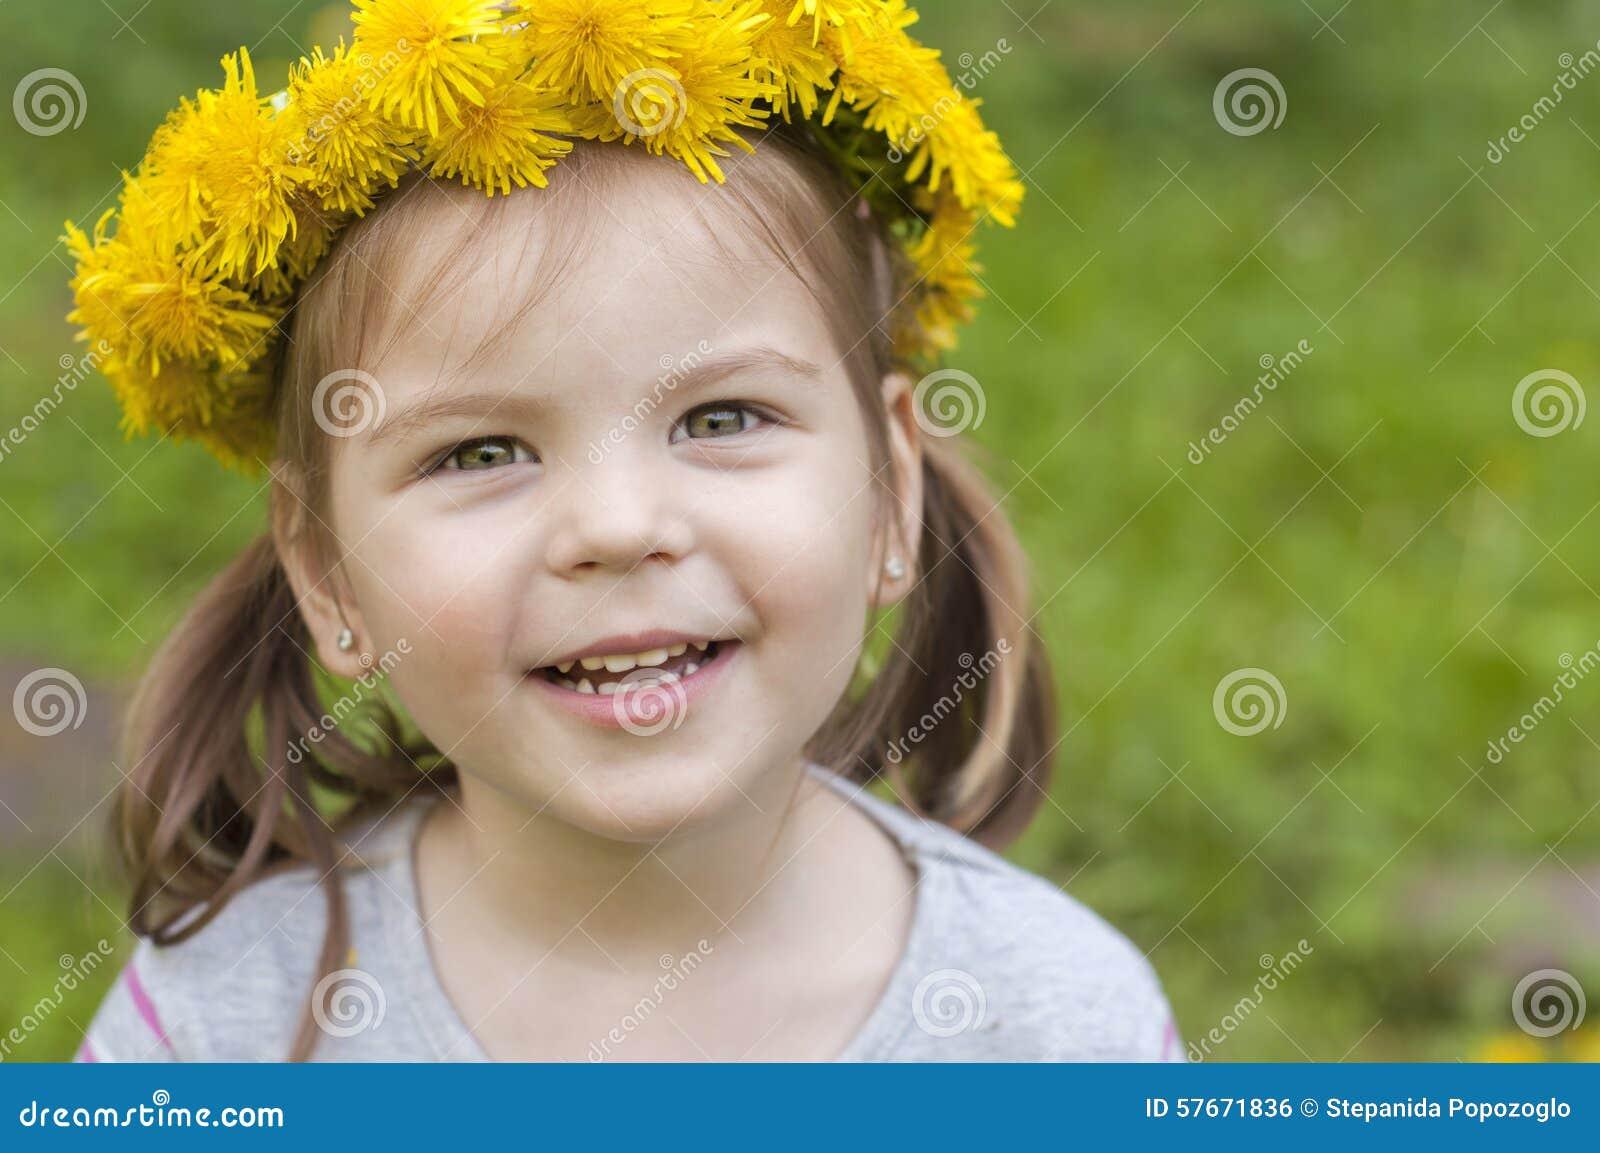 Menina feliz com flores amarelas